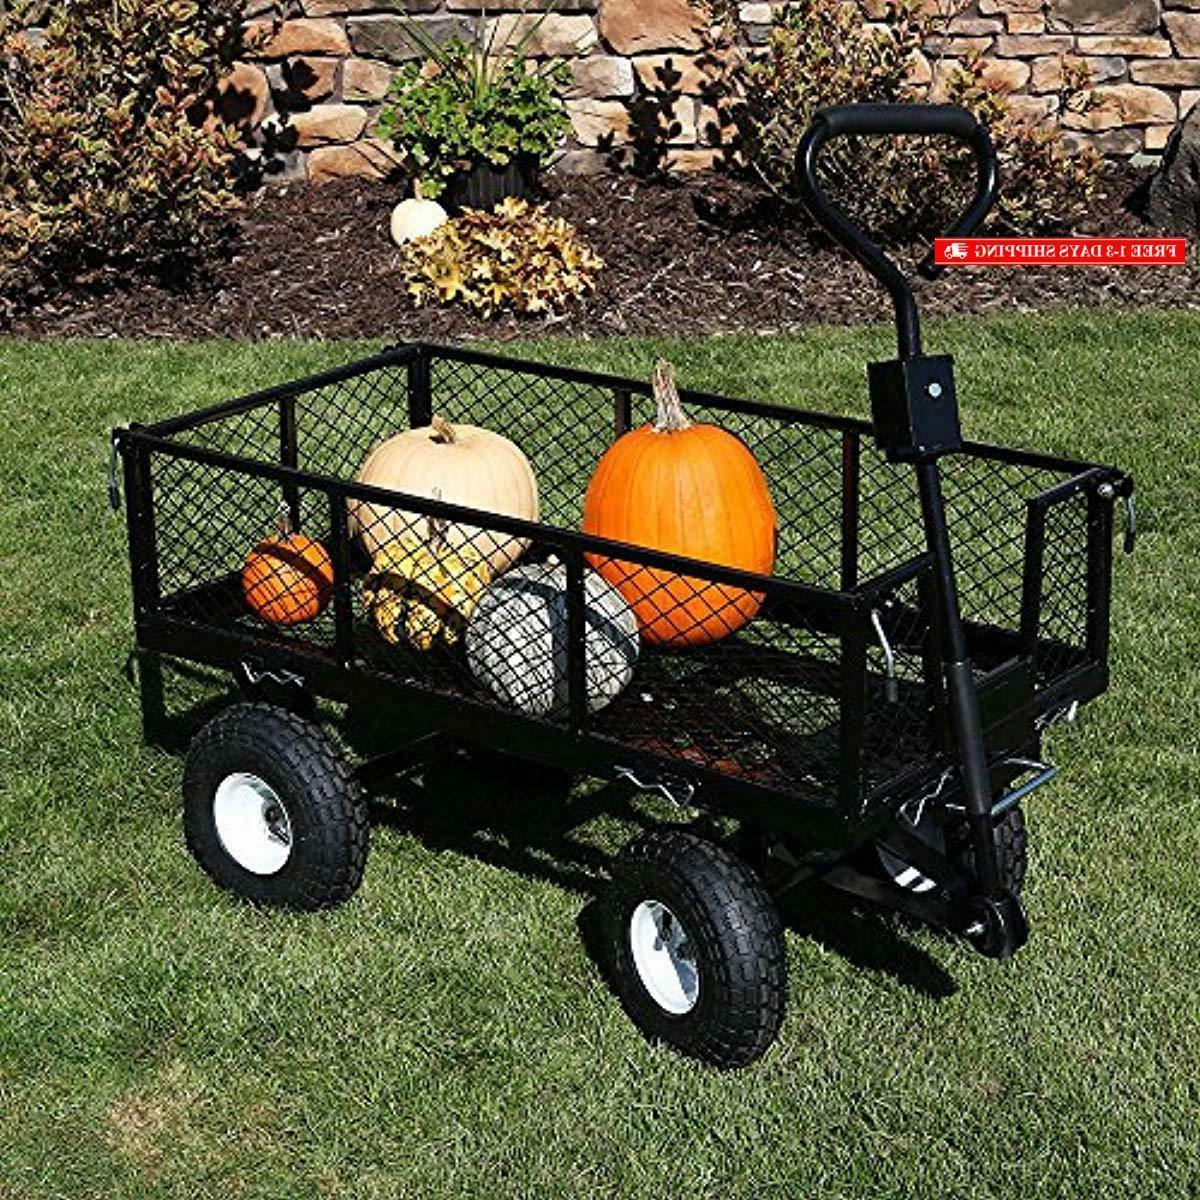 Sunnydaze Utility Steel Garden Cart, Lawn Wagon with